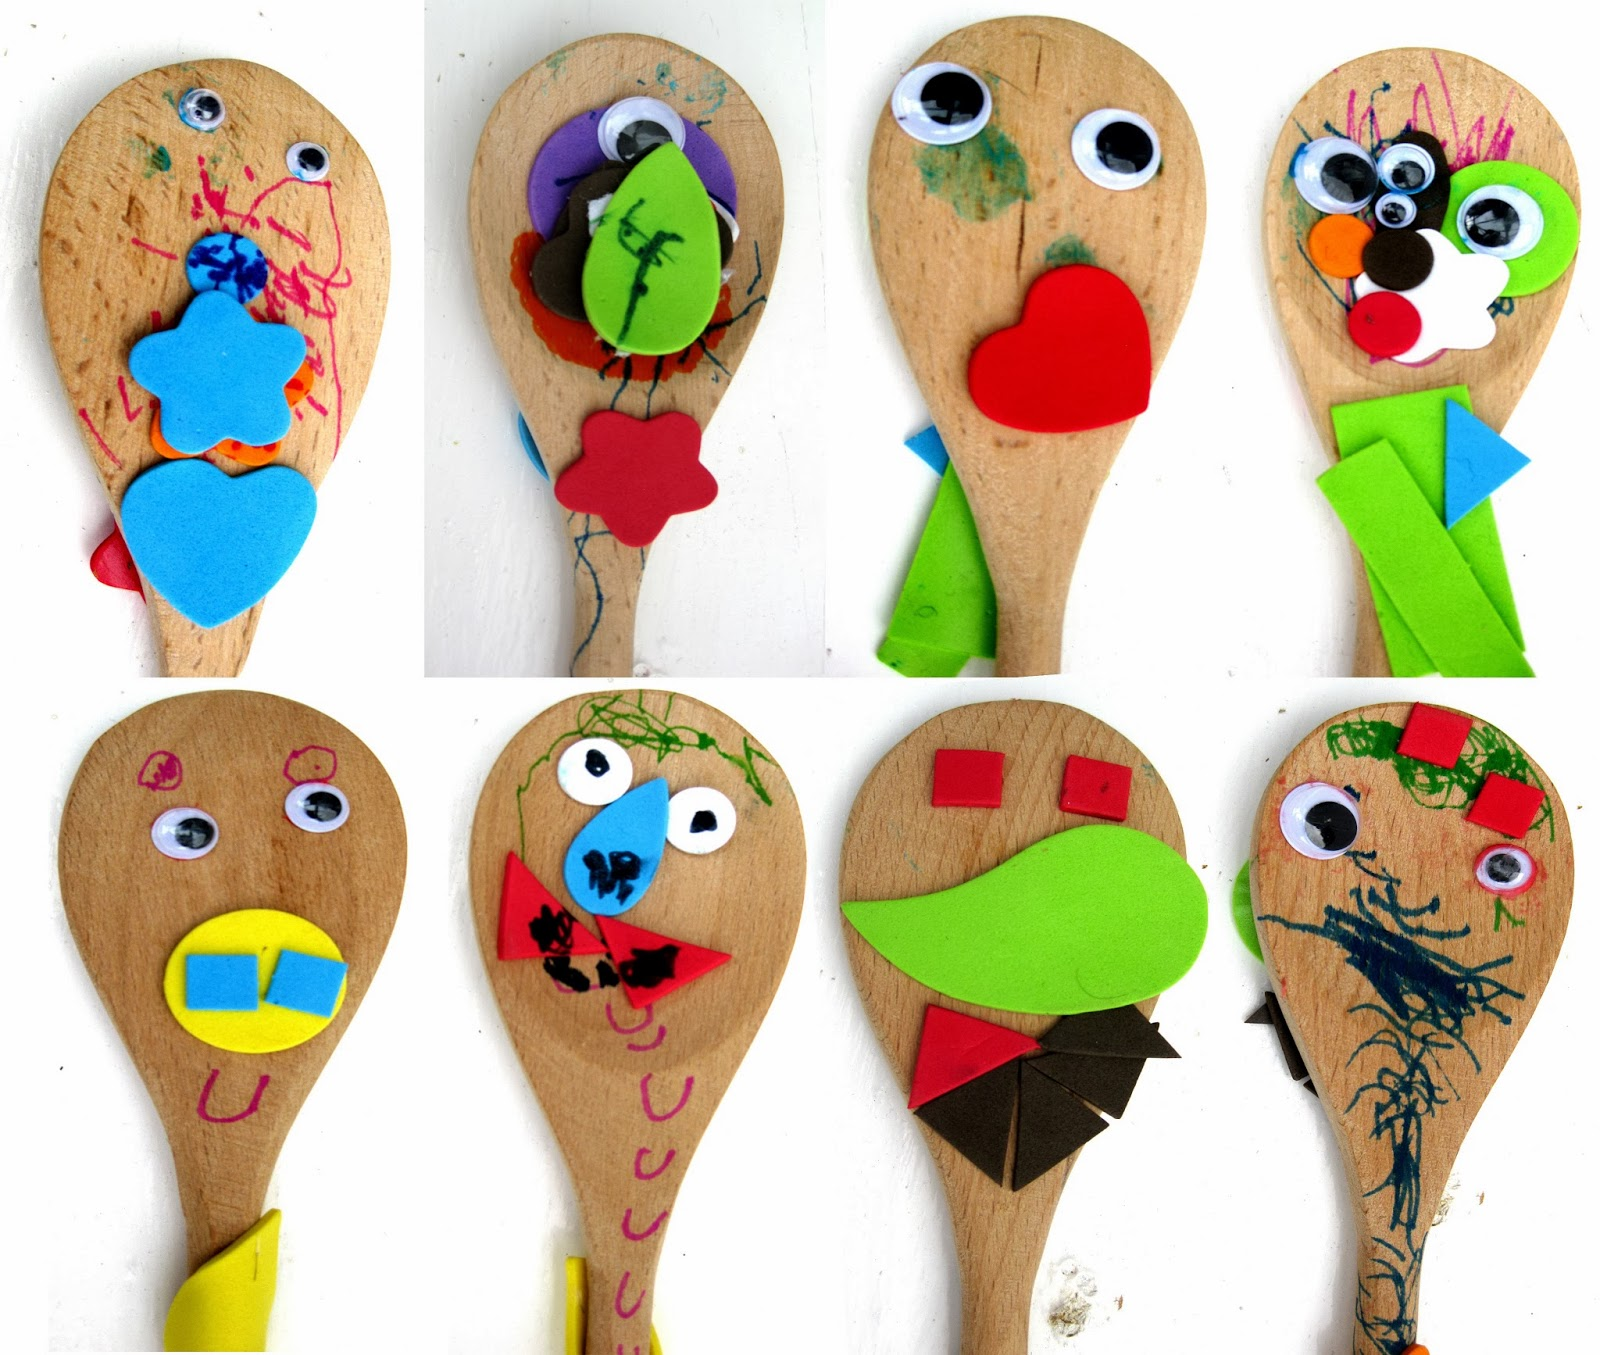 Wooden Spoon Puppets on Halloween Birthday Party Activities